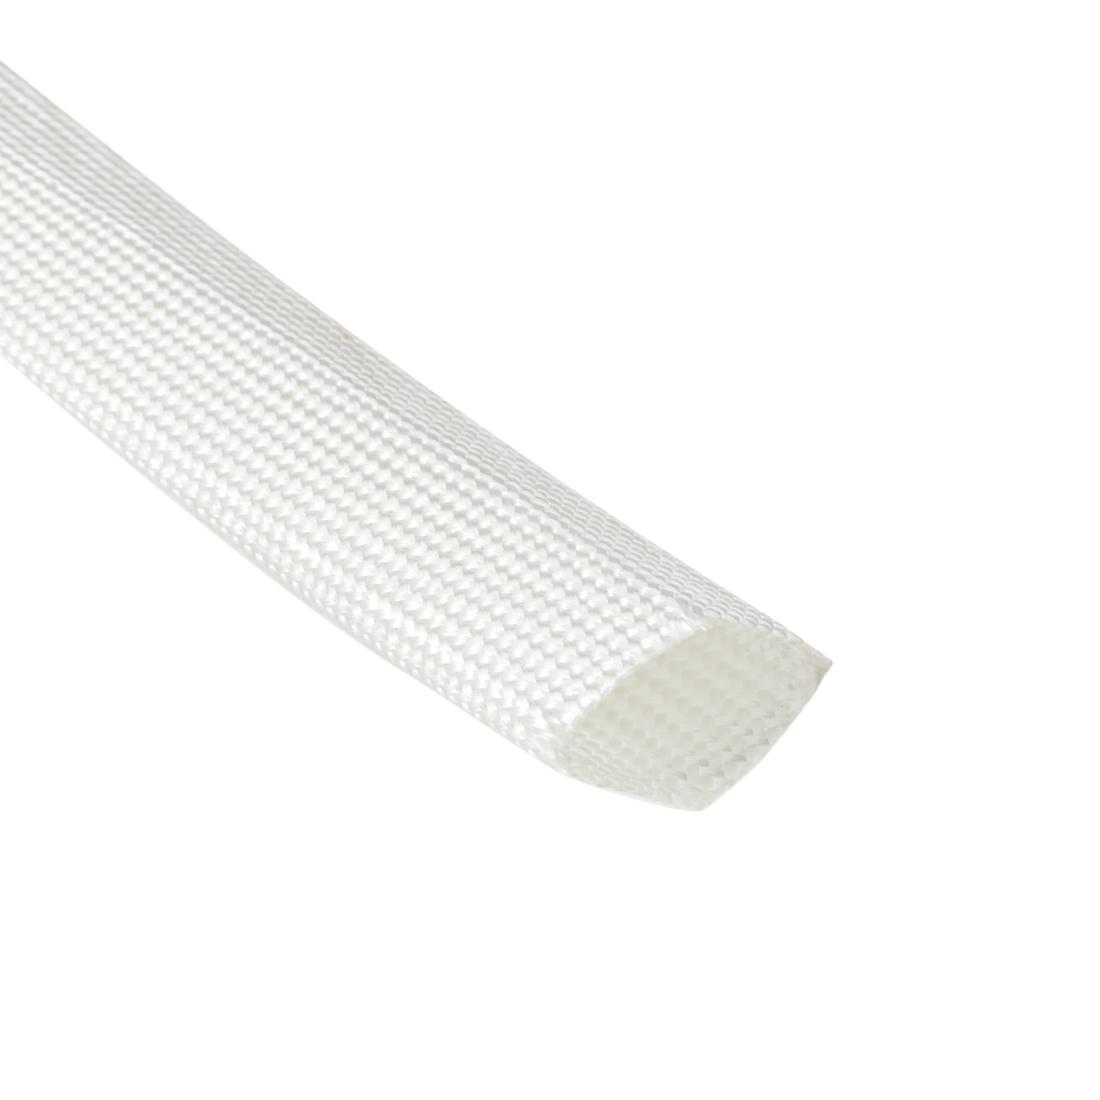 White Electrical Wire Fiberglass PVC Insulation Sleeve 2M Long 20mm Dia